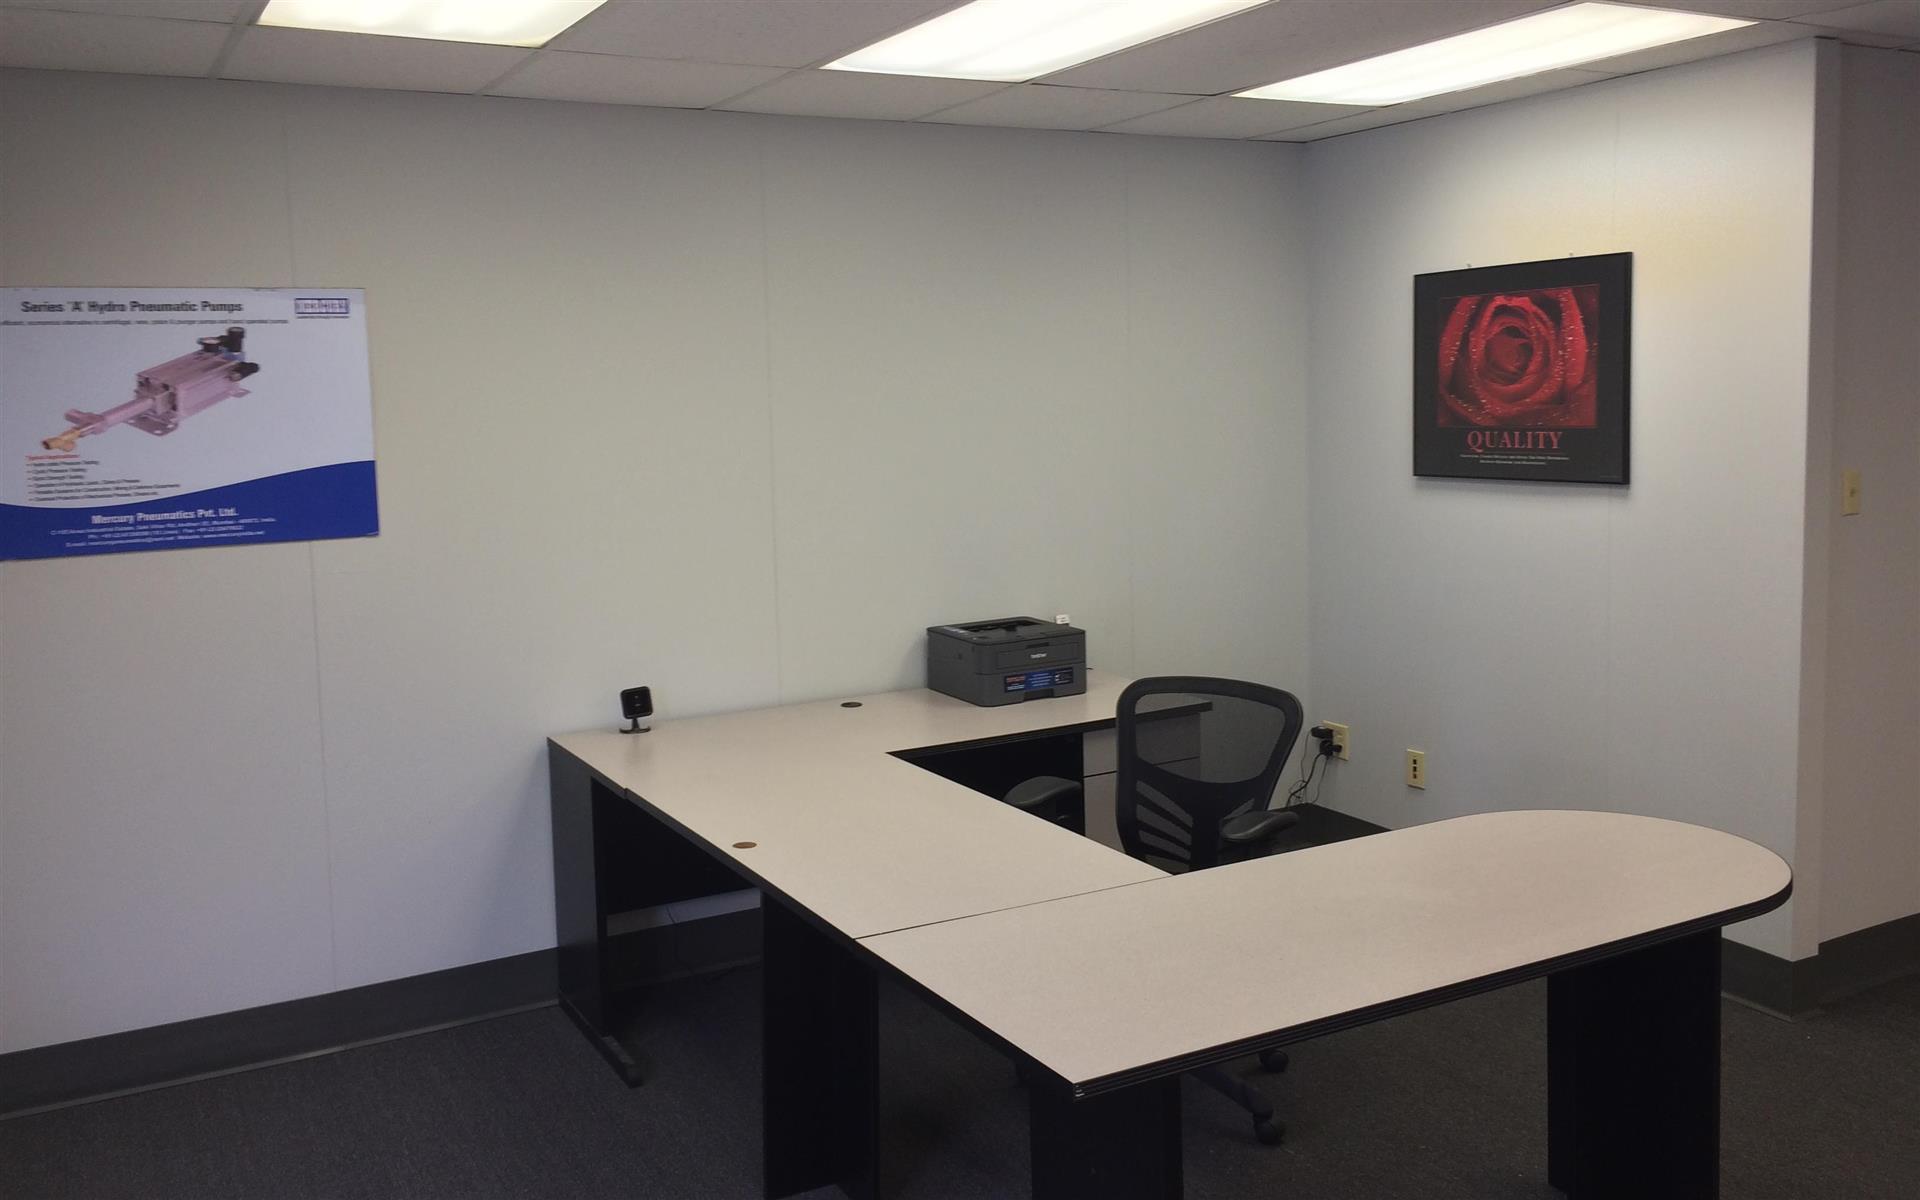 Chiketa-Phoenix Office Space - Open work space